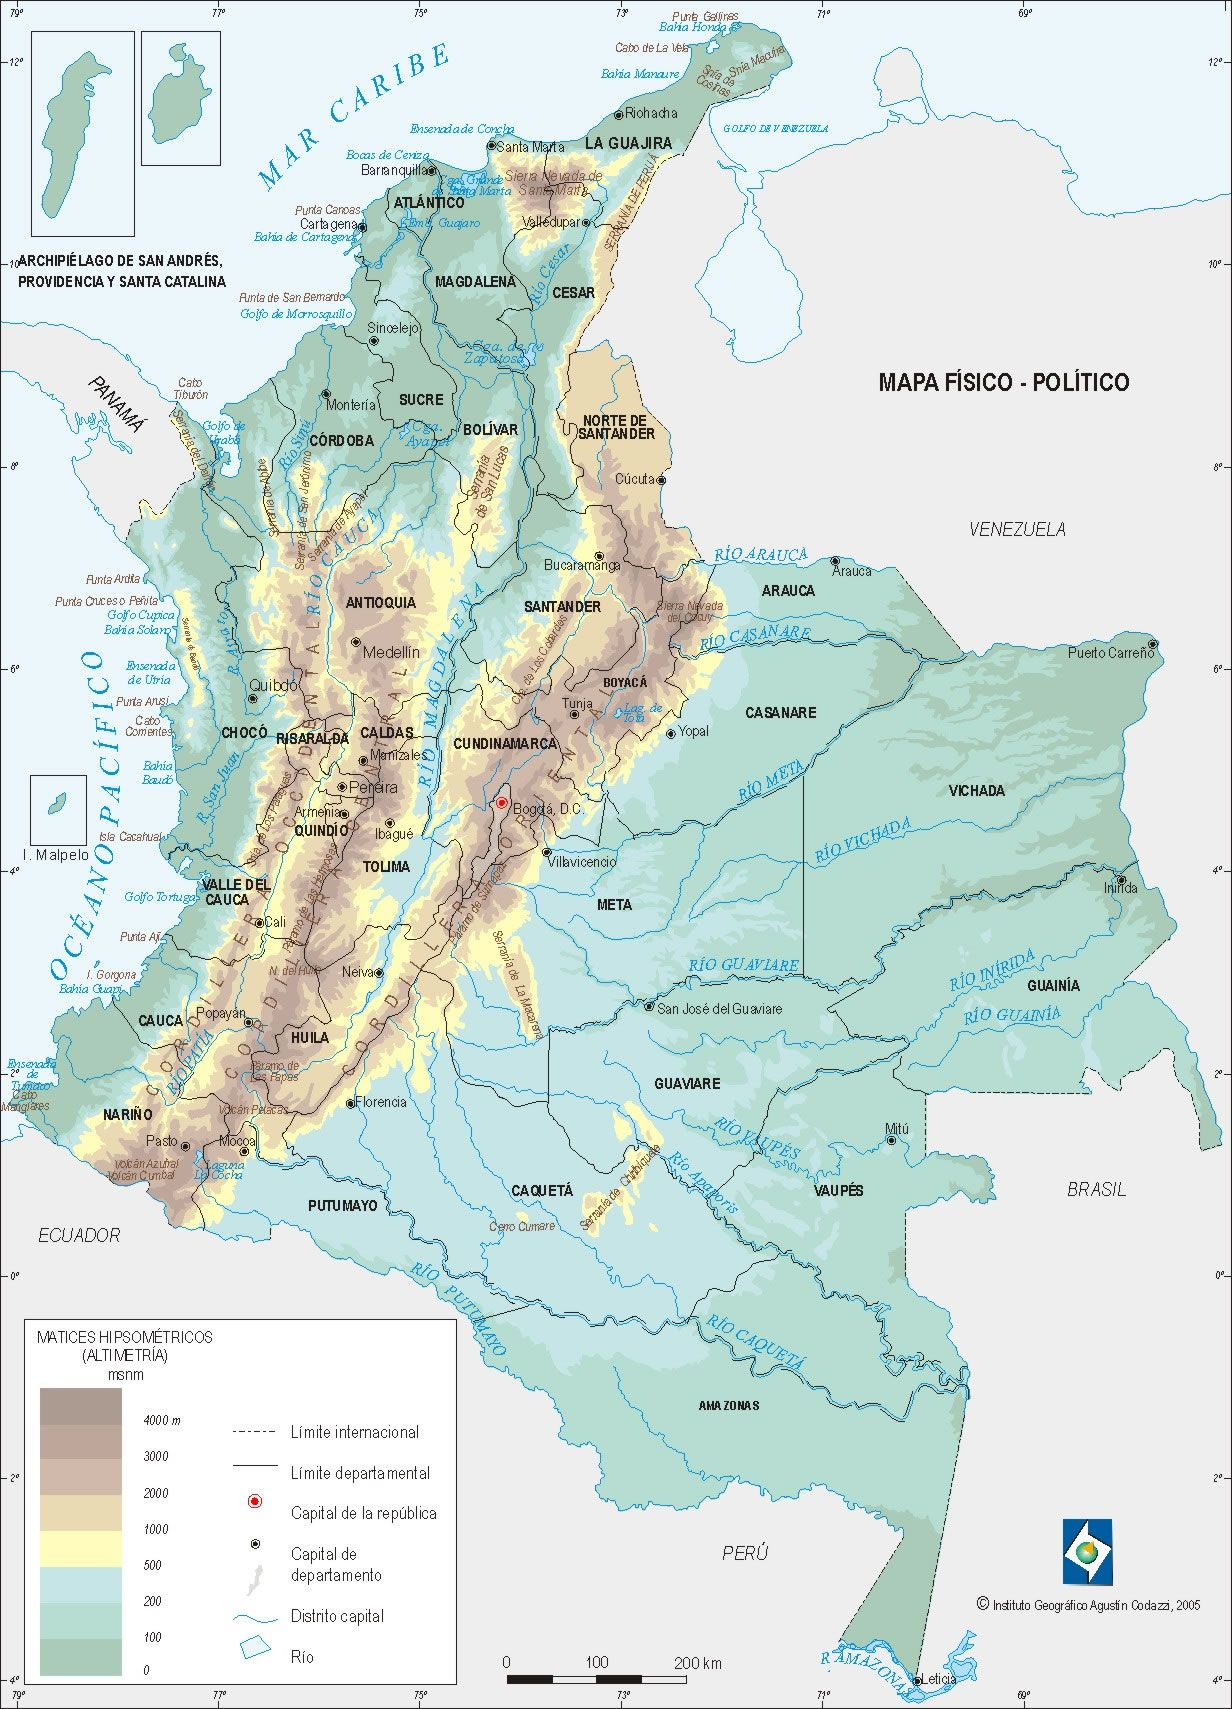 Hidrografia Geografia Historia De Colombia En 2020 Mapa De